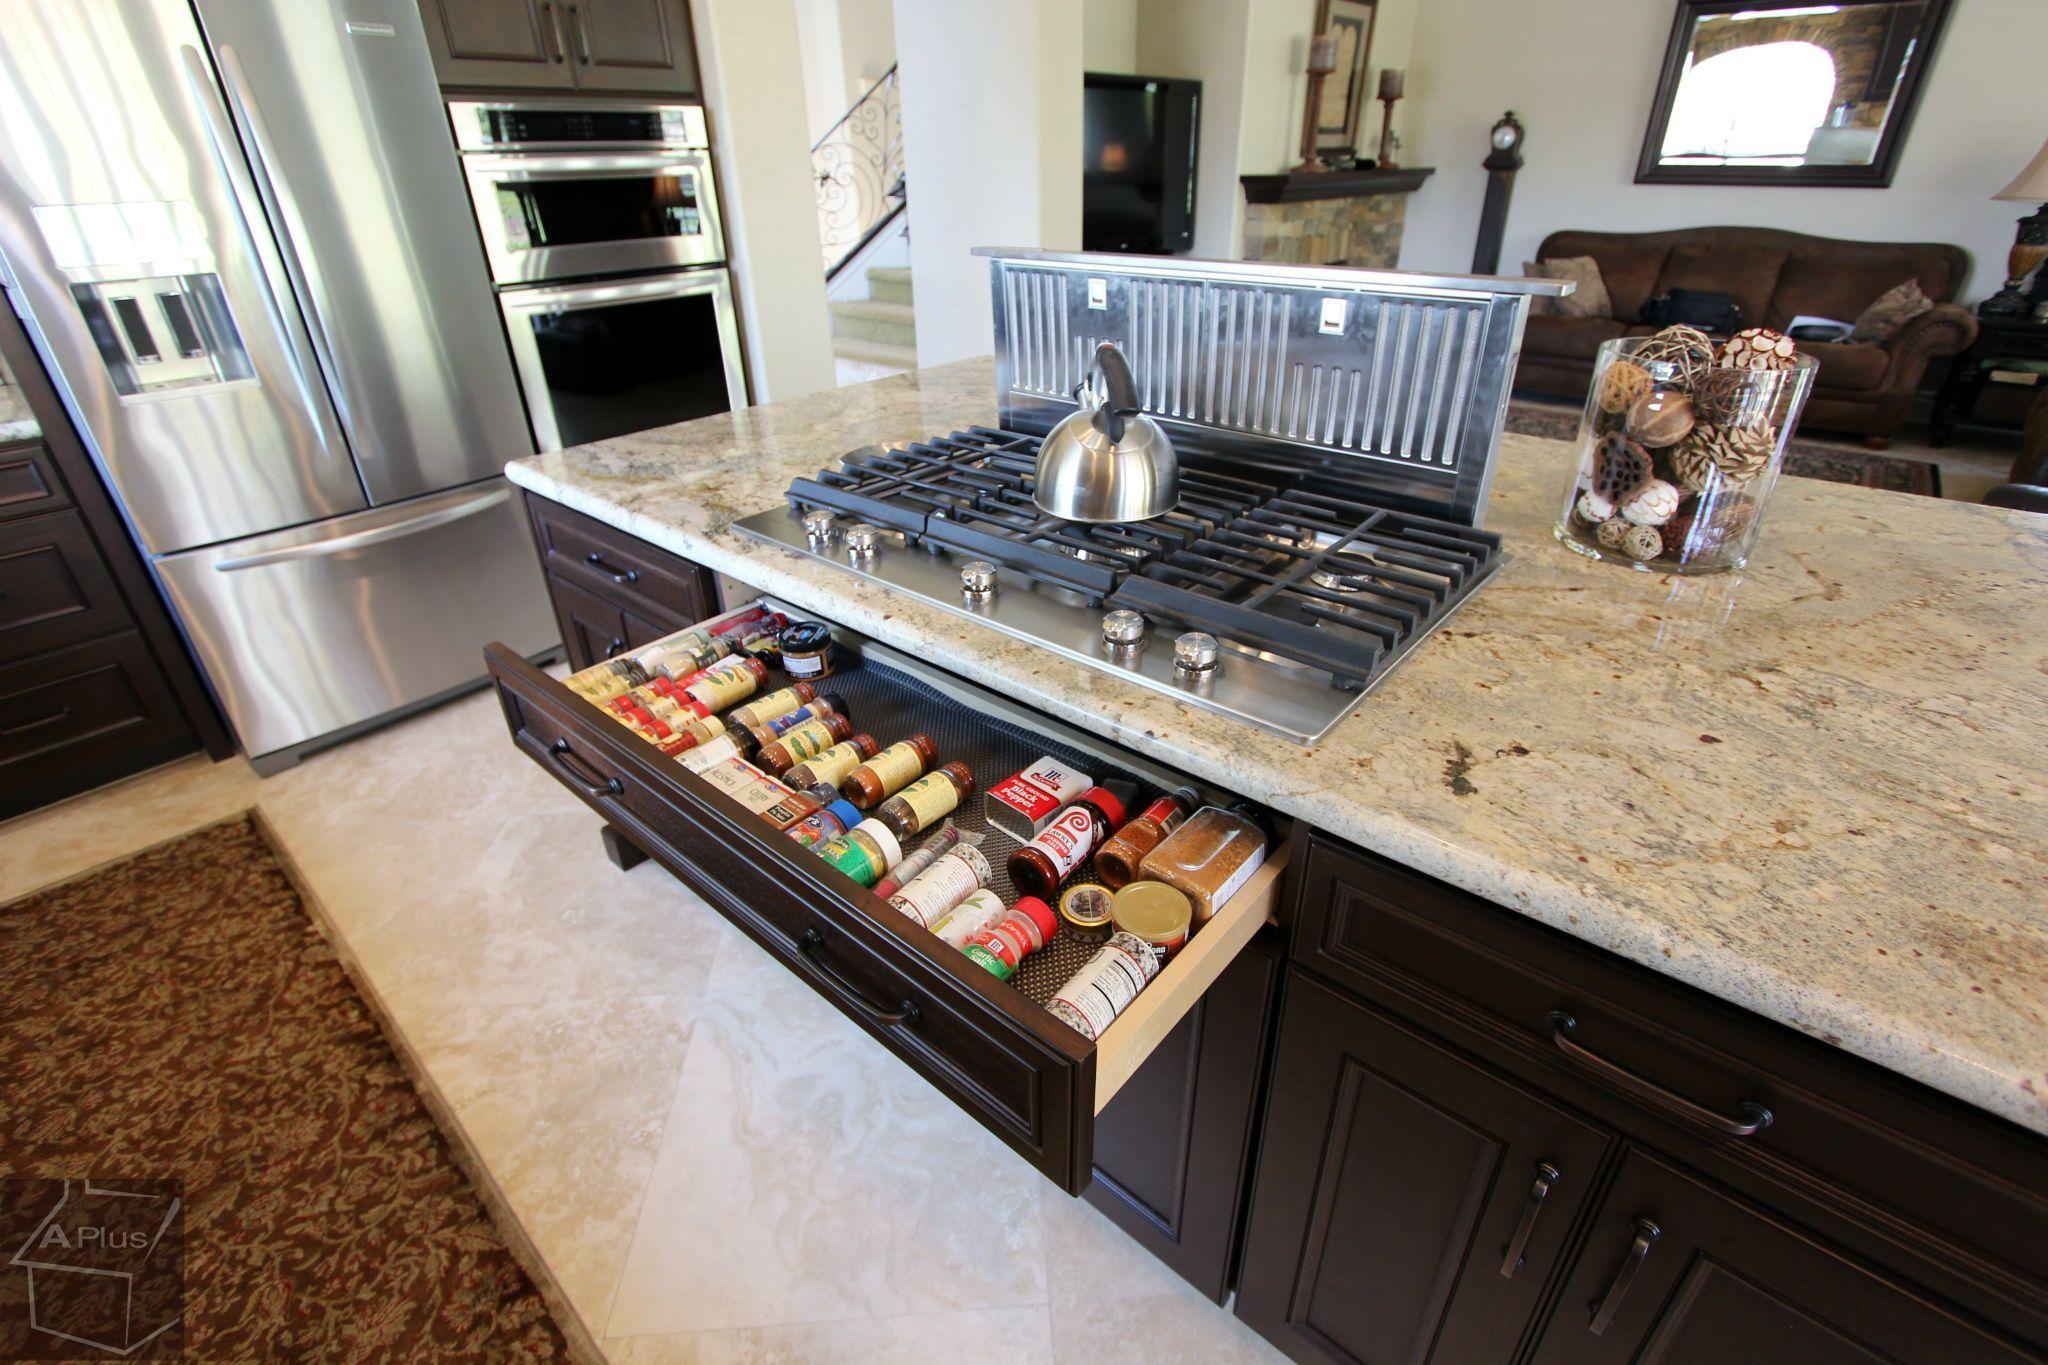 Kitchen Designer Orange County Prepossessing Design Build Traditional #kitchenremodel With #customcabinets Inspiration